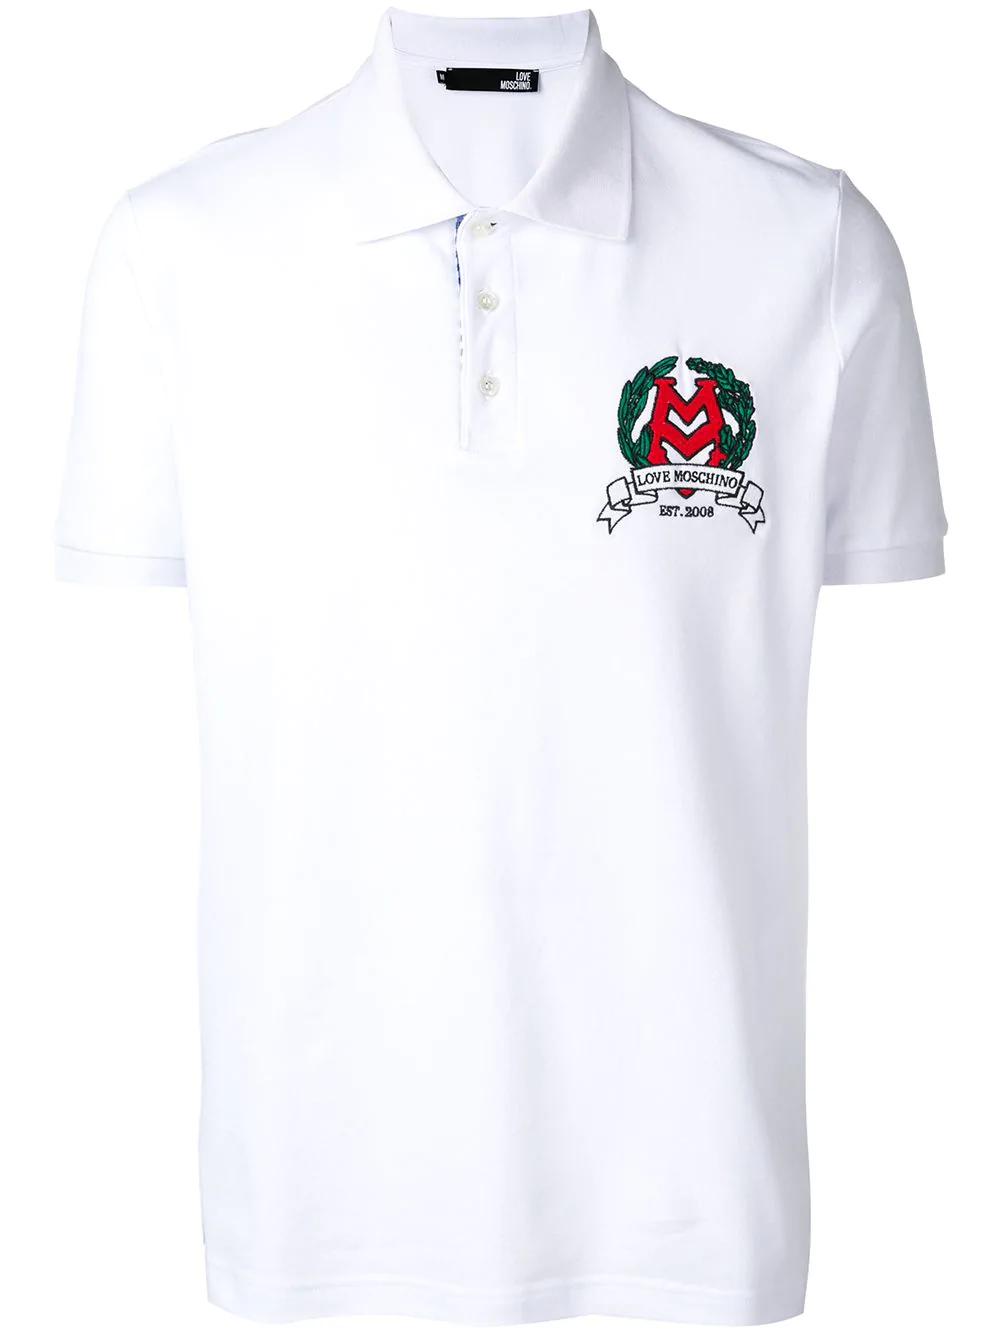 97799d2d Custom Polo Shirts, Men's Embroidered Polo Shirts | Vistaprint